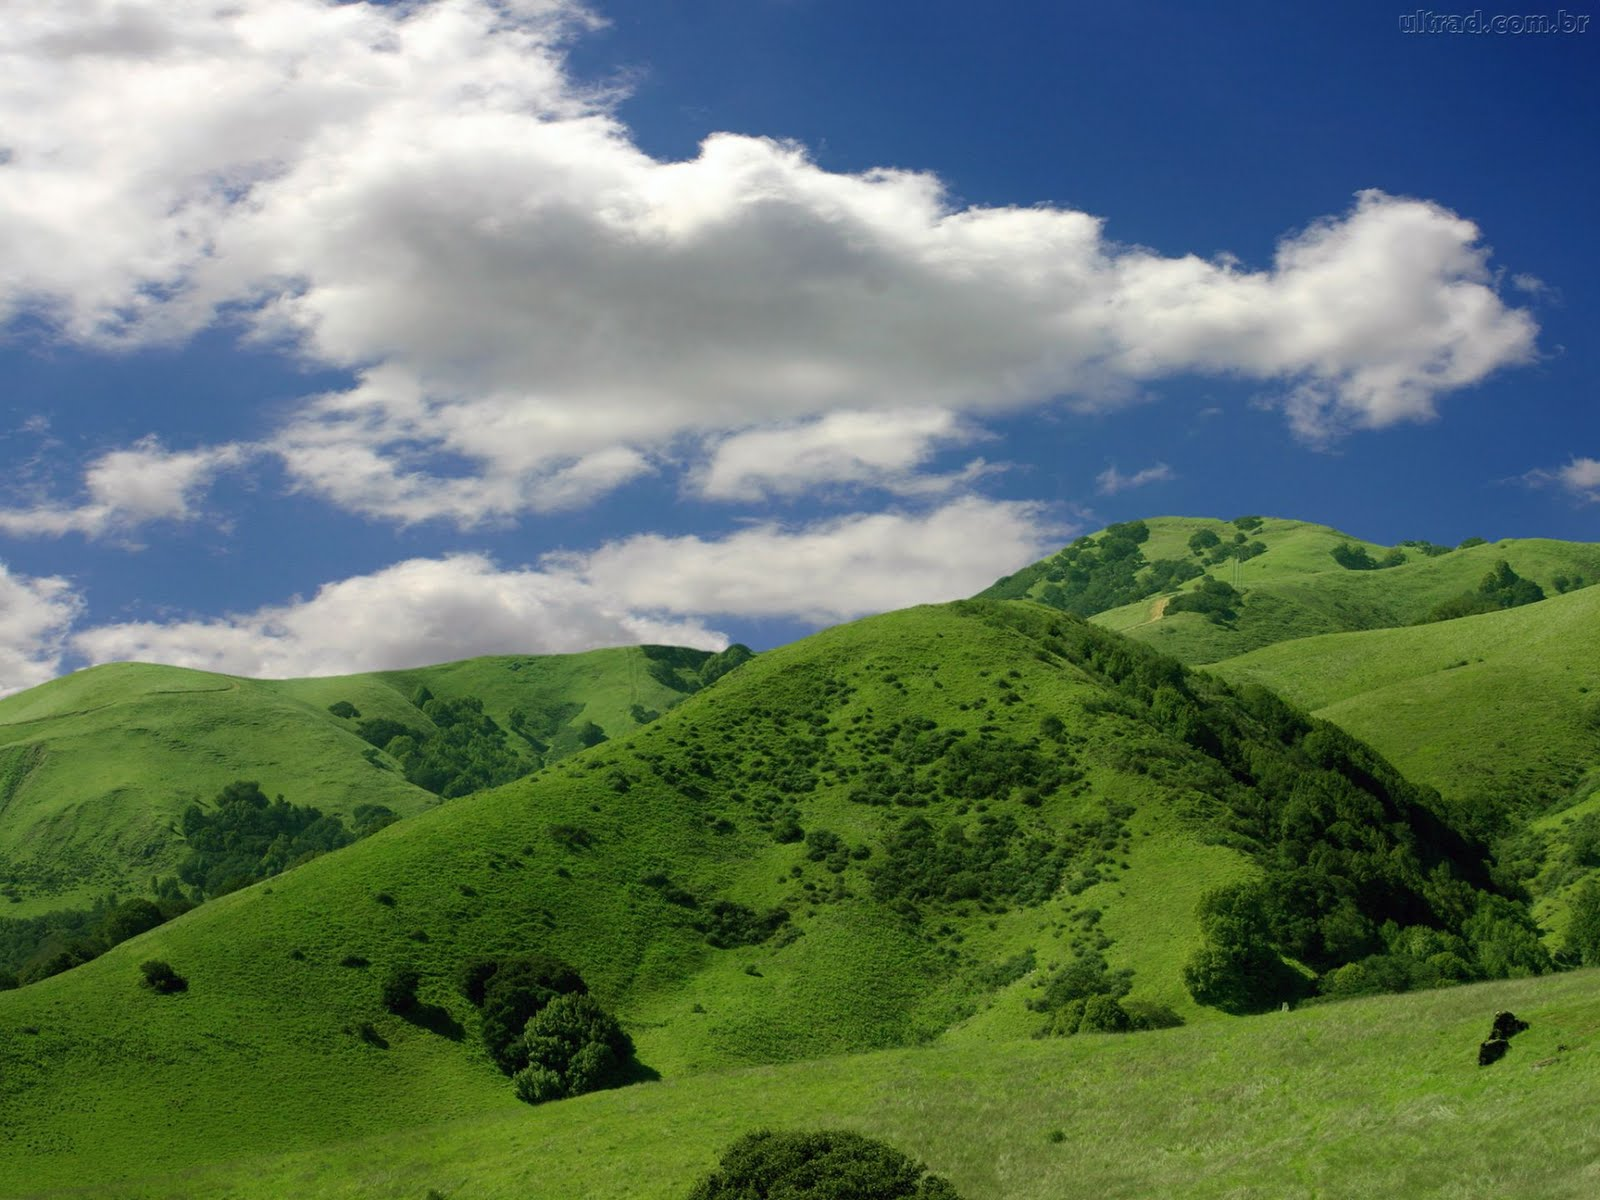 mountain and the greenary - photo #33